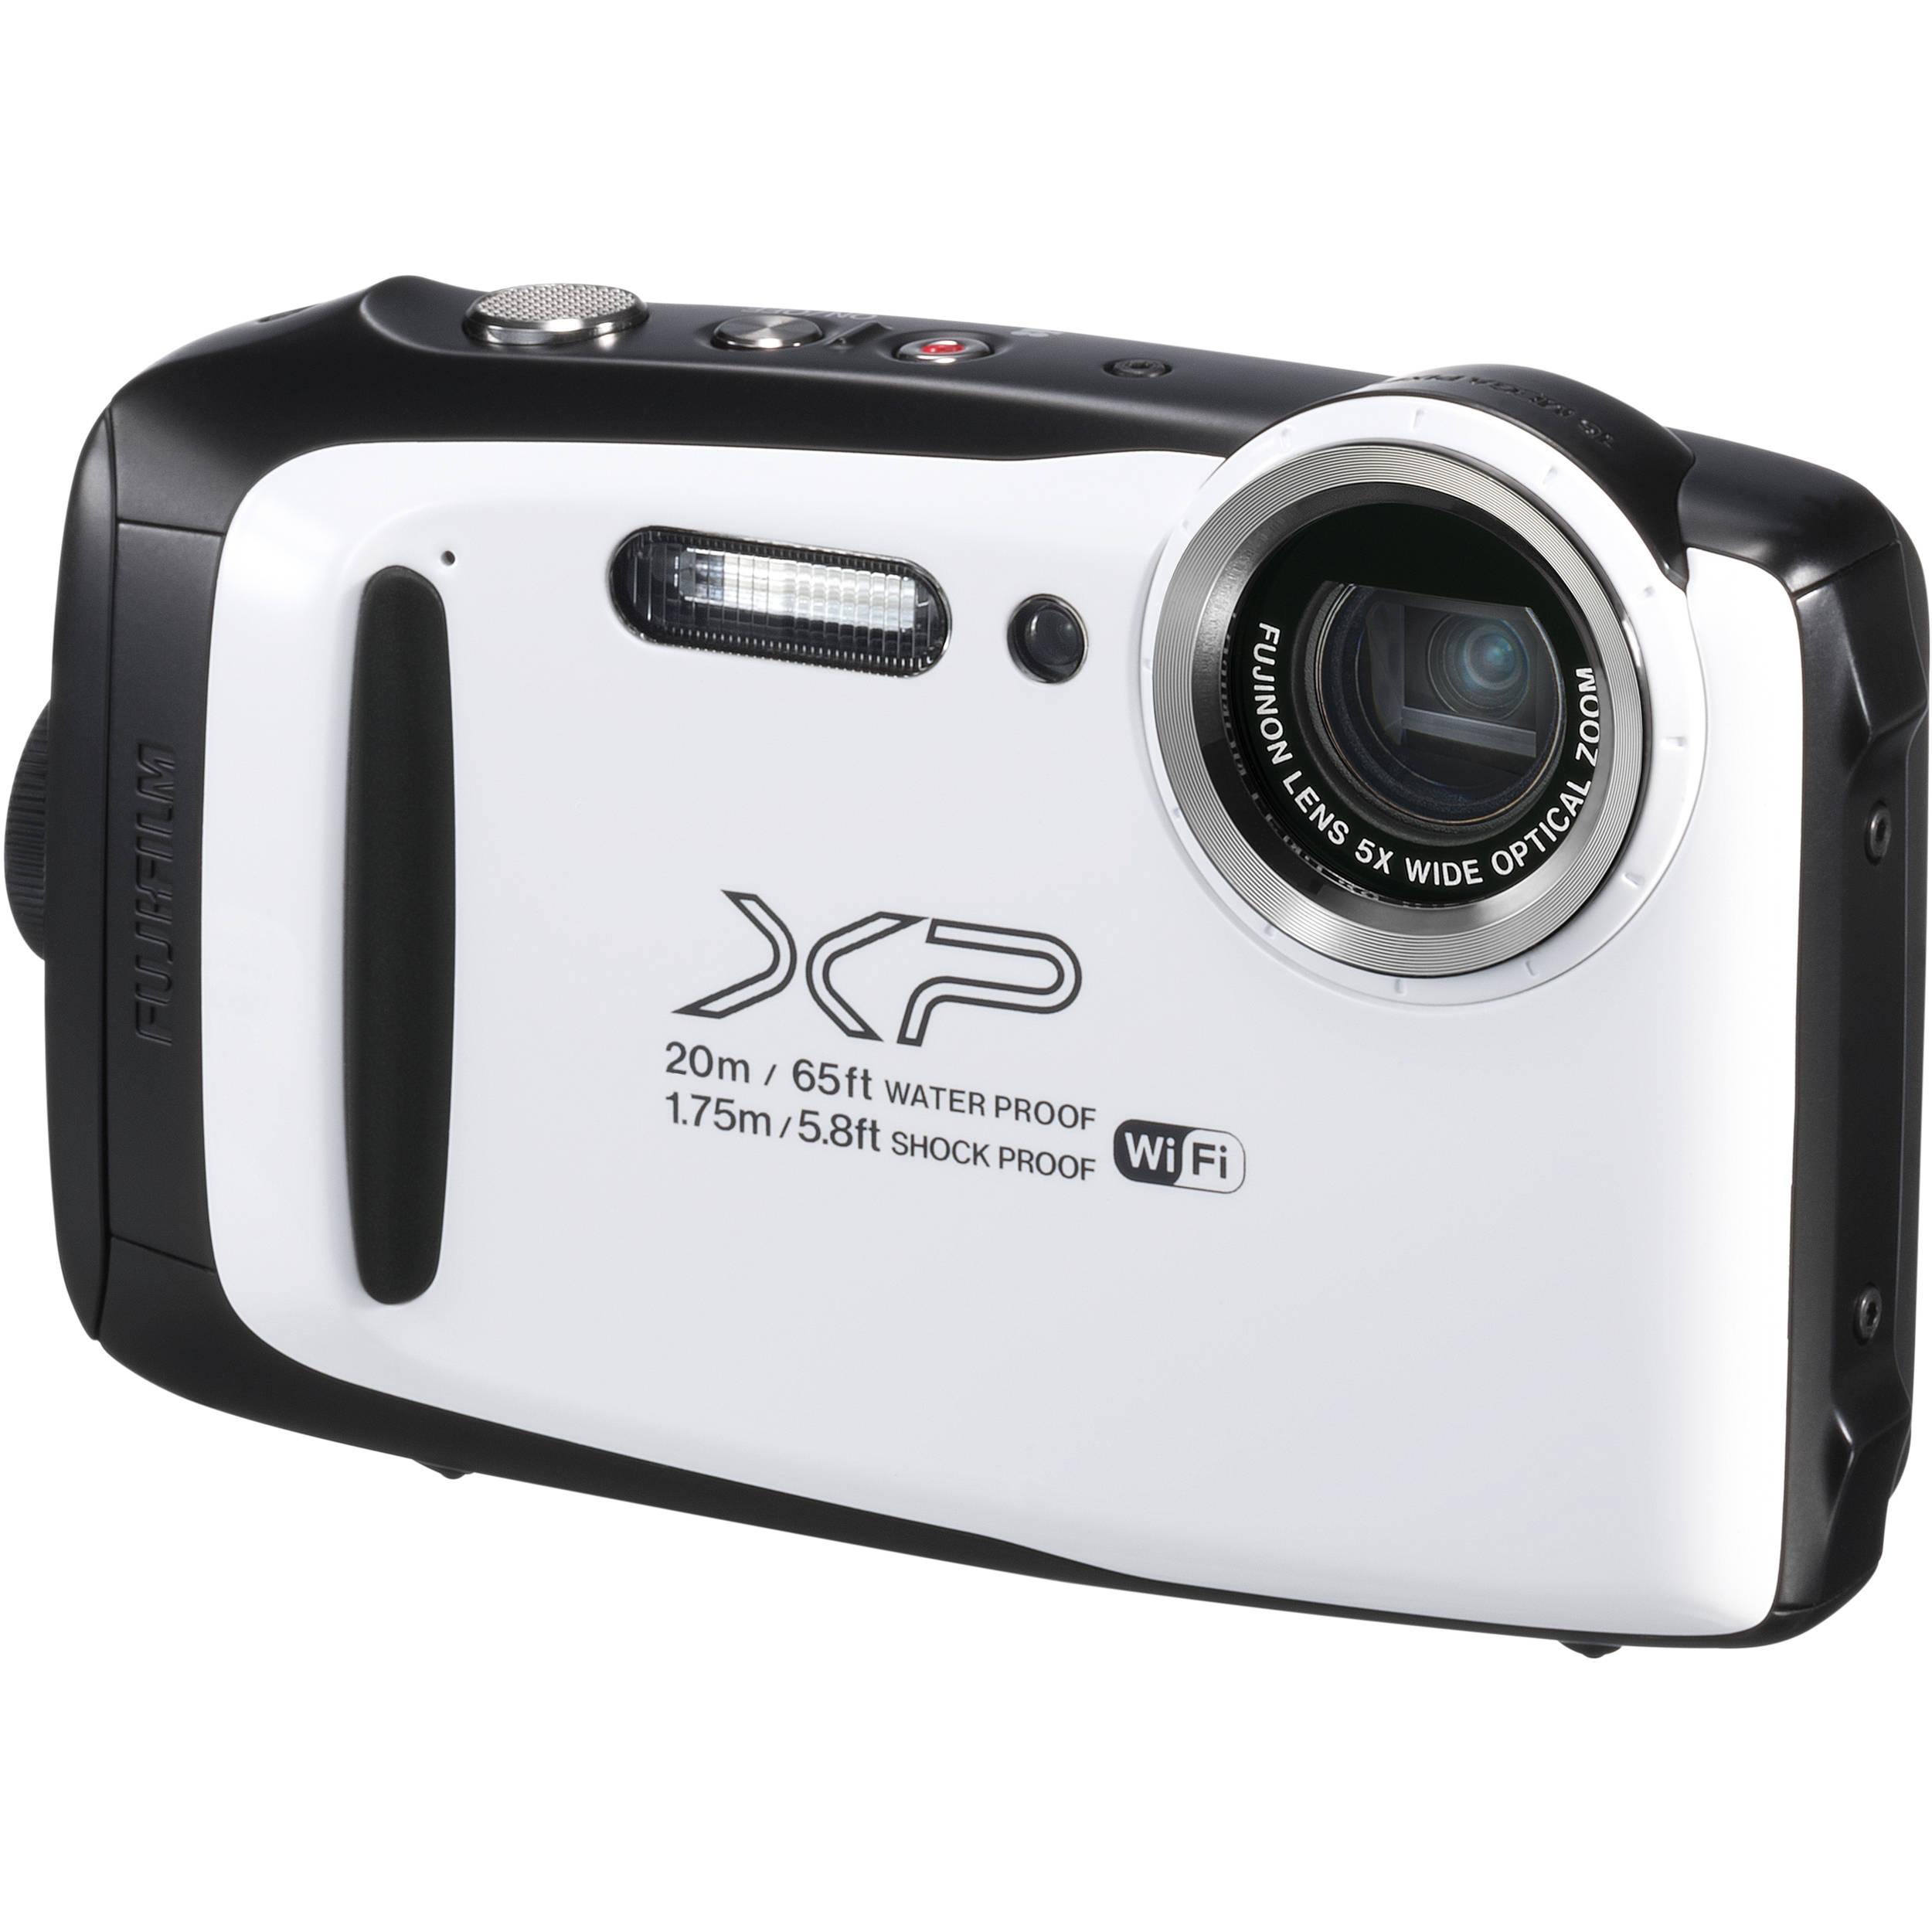 FUJIFILM FinePix XP130 Digital Camera White